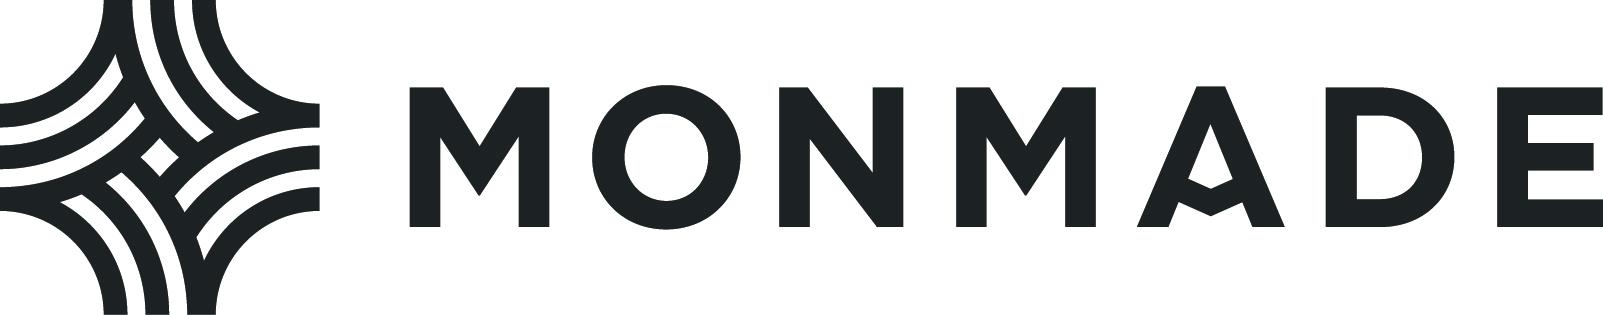 monmade_logo_black